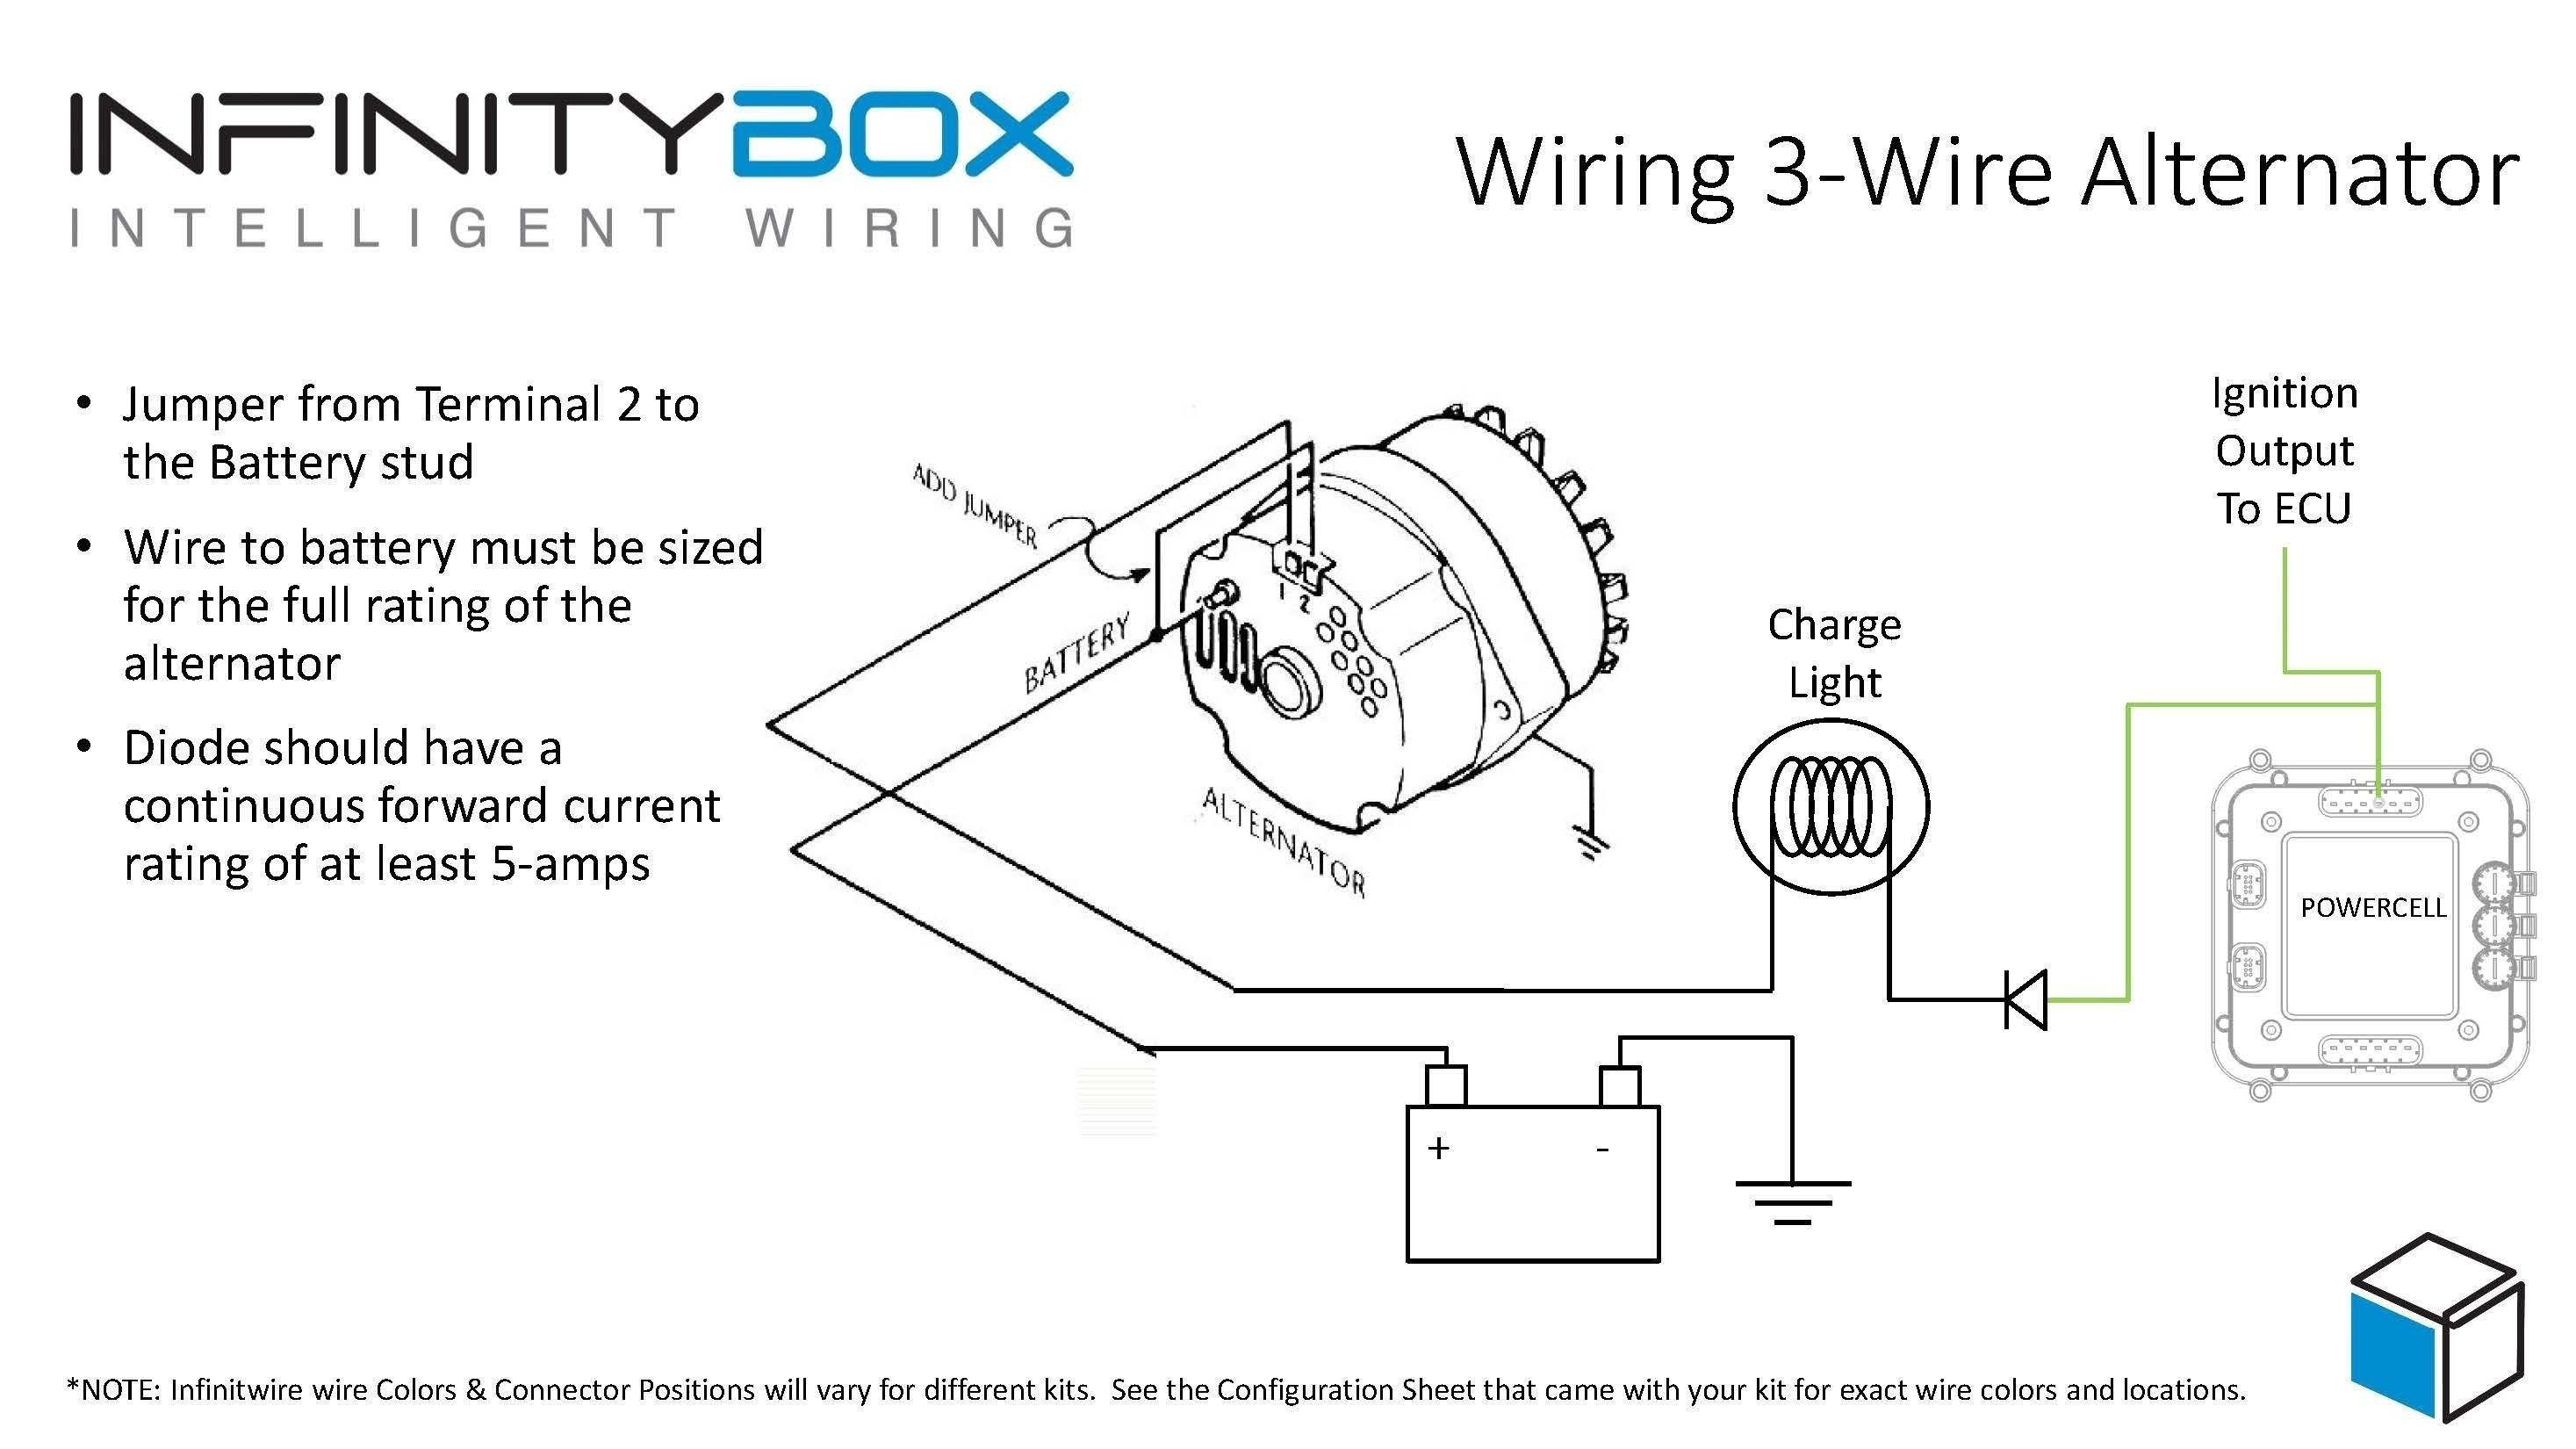 Single Wire Alternator Wiring Diagram Fresh Wiring Diagram E Wire Alternator Joescablecar Of Single Wire Alternator Wiring Diagram